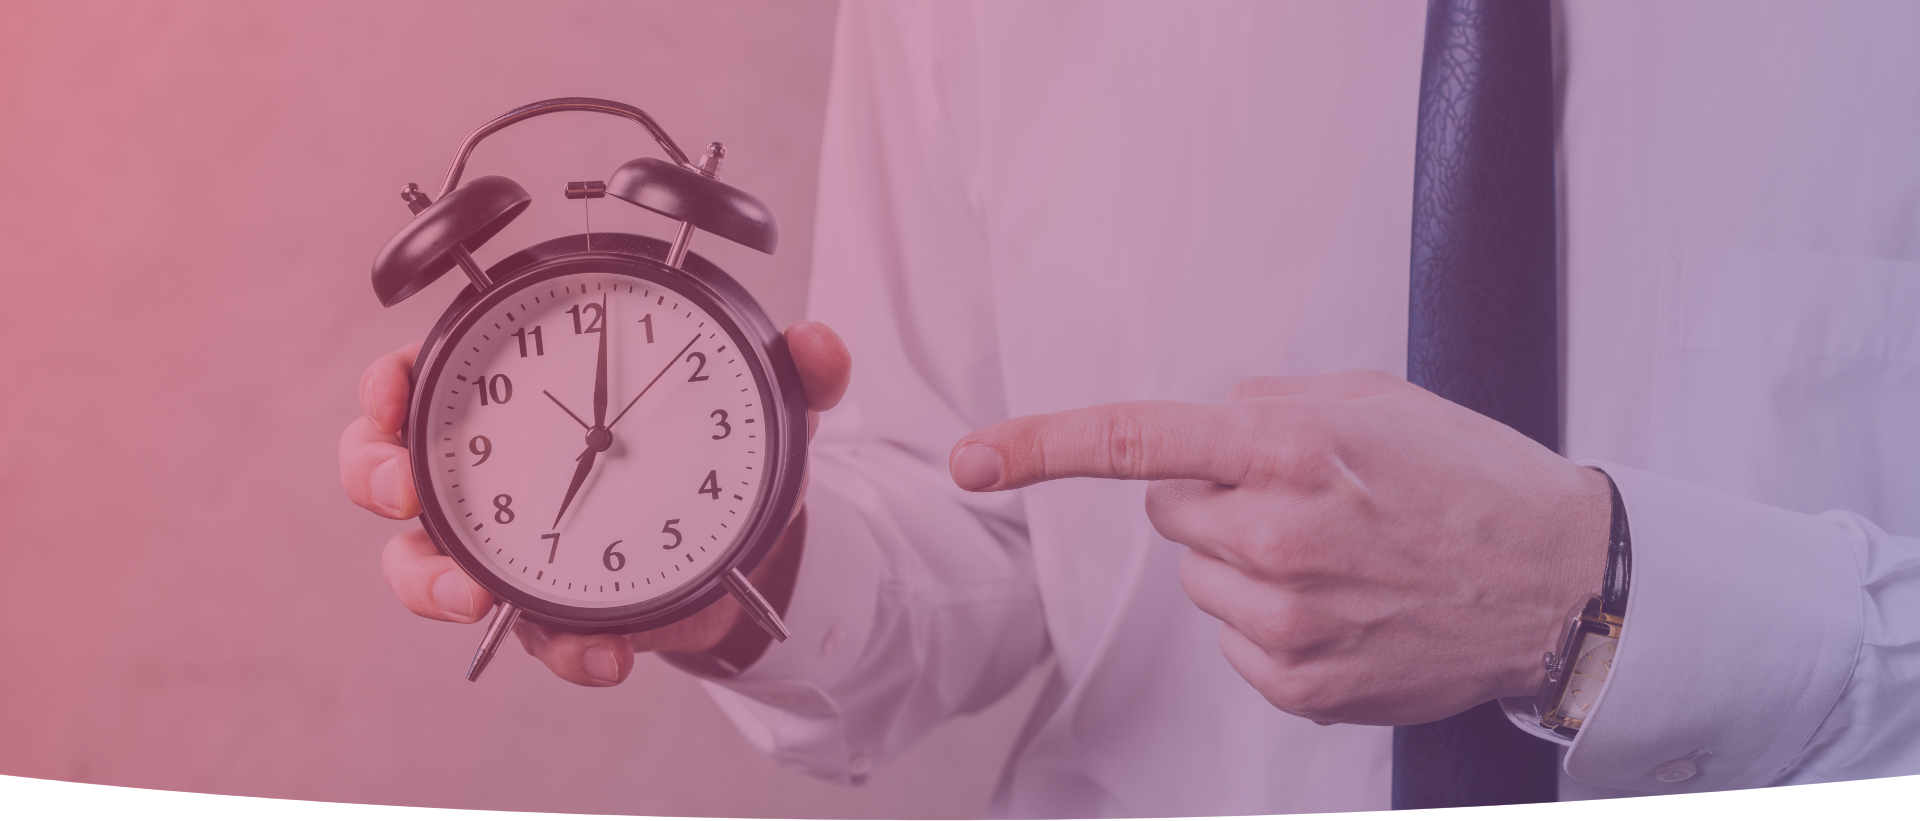 Chronos La Mejor Manera De Administrar Tu Tiempo